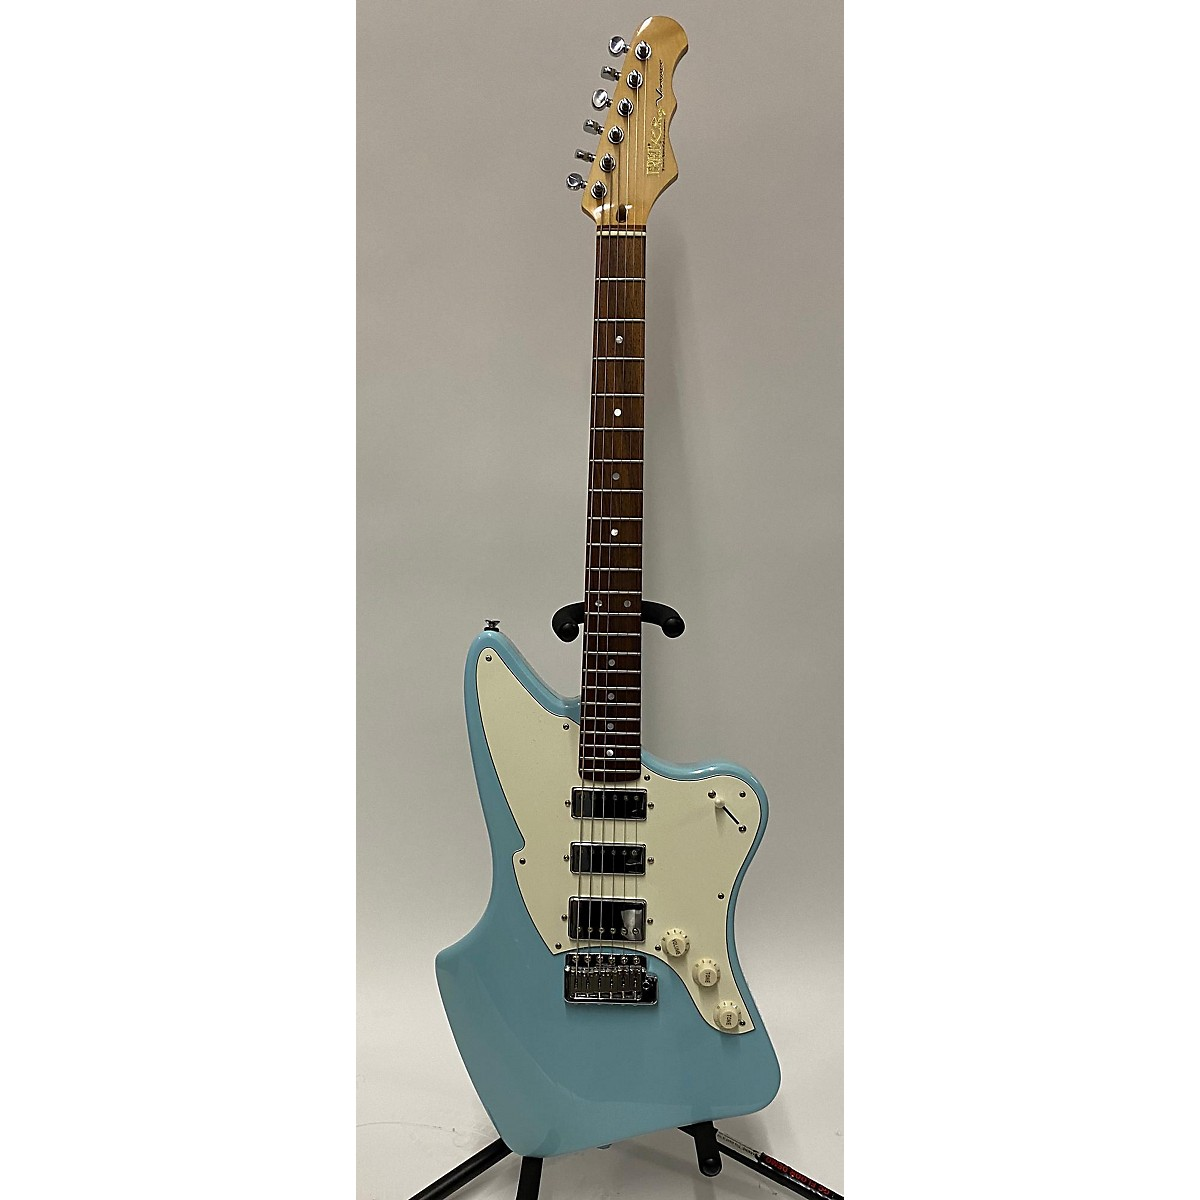 Fret-King VENTURA Solid Body Electric Guitar